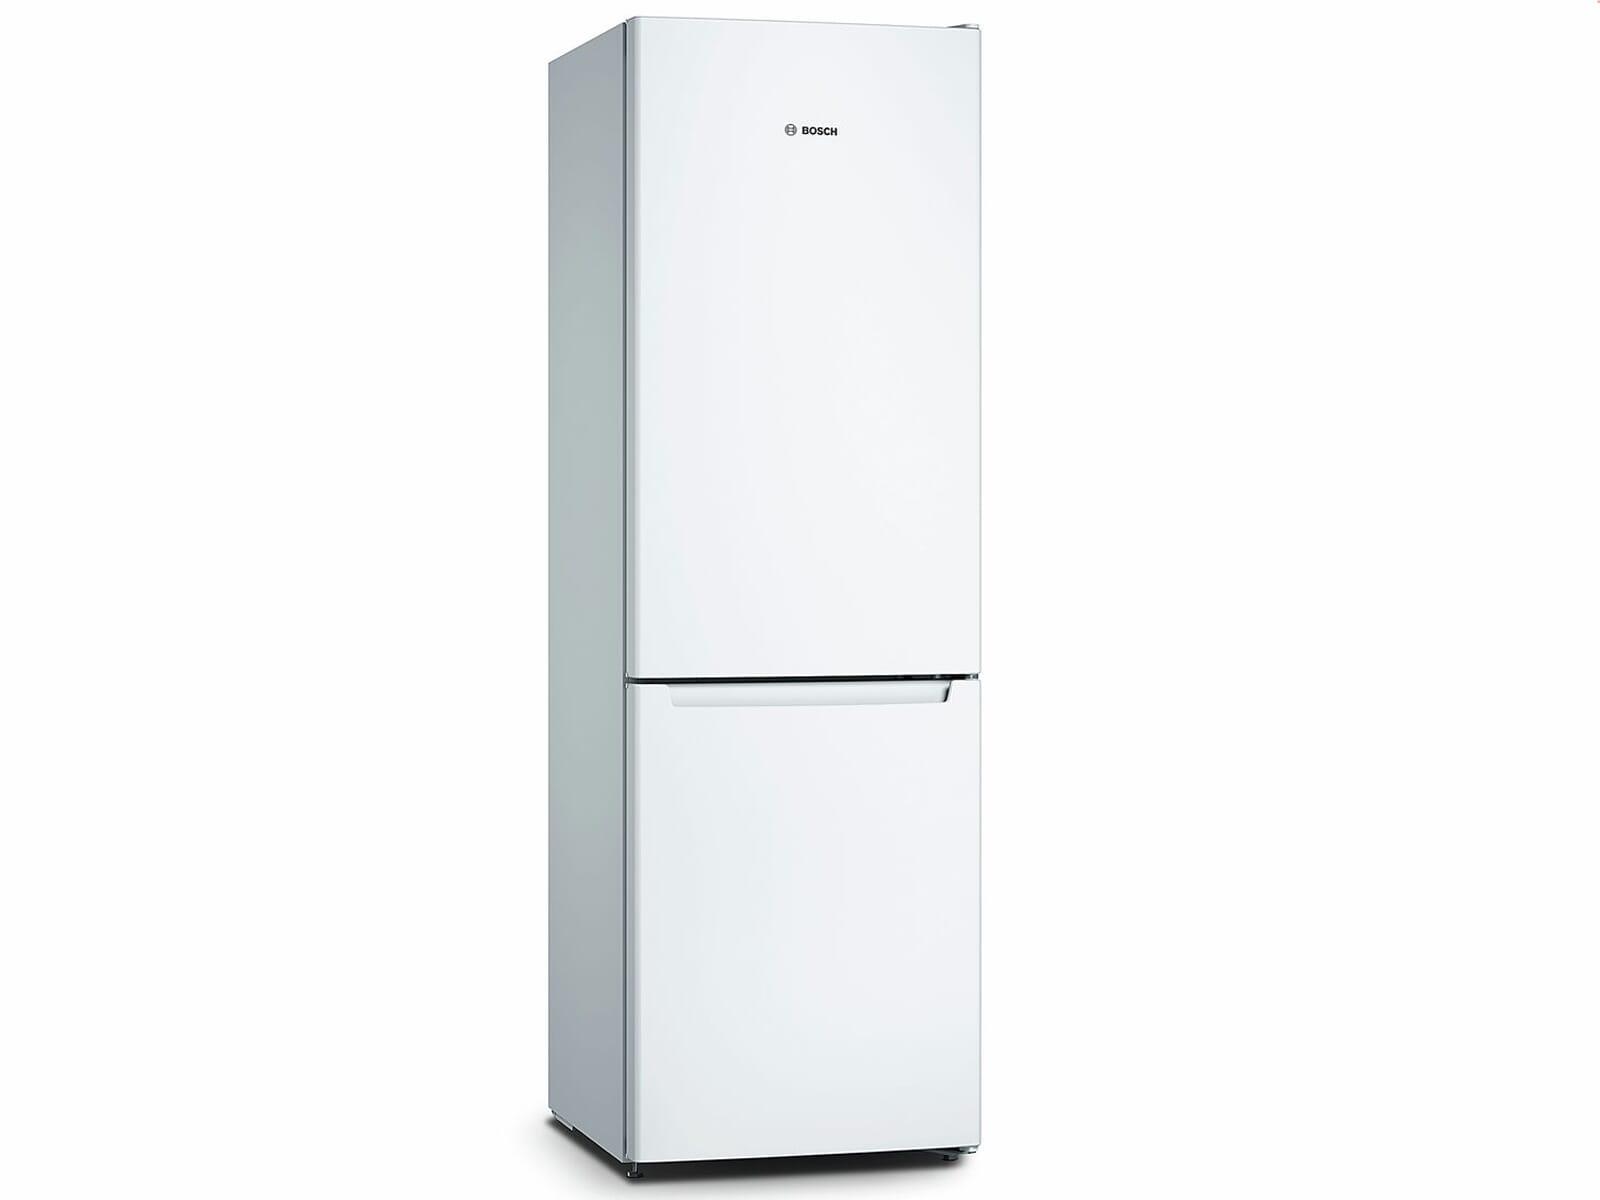 Bosch Kühlschrank Kgn 36 Xi 45 : Bosch kgn36nw30 kühl gefrierkombination weiß